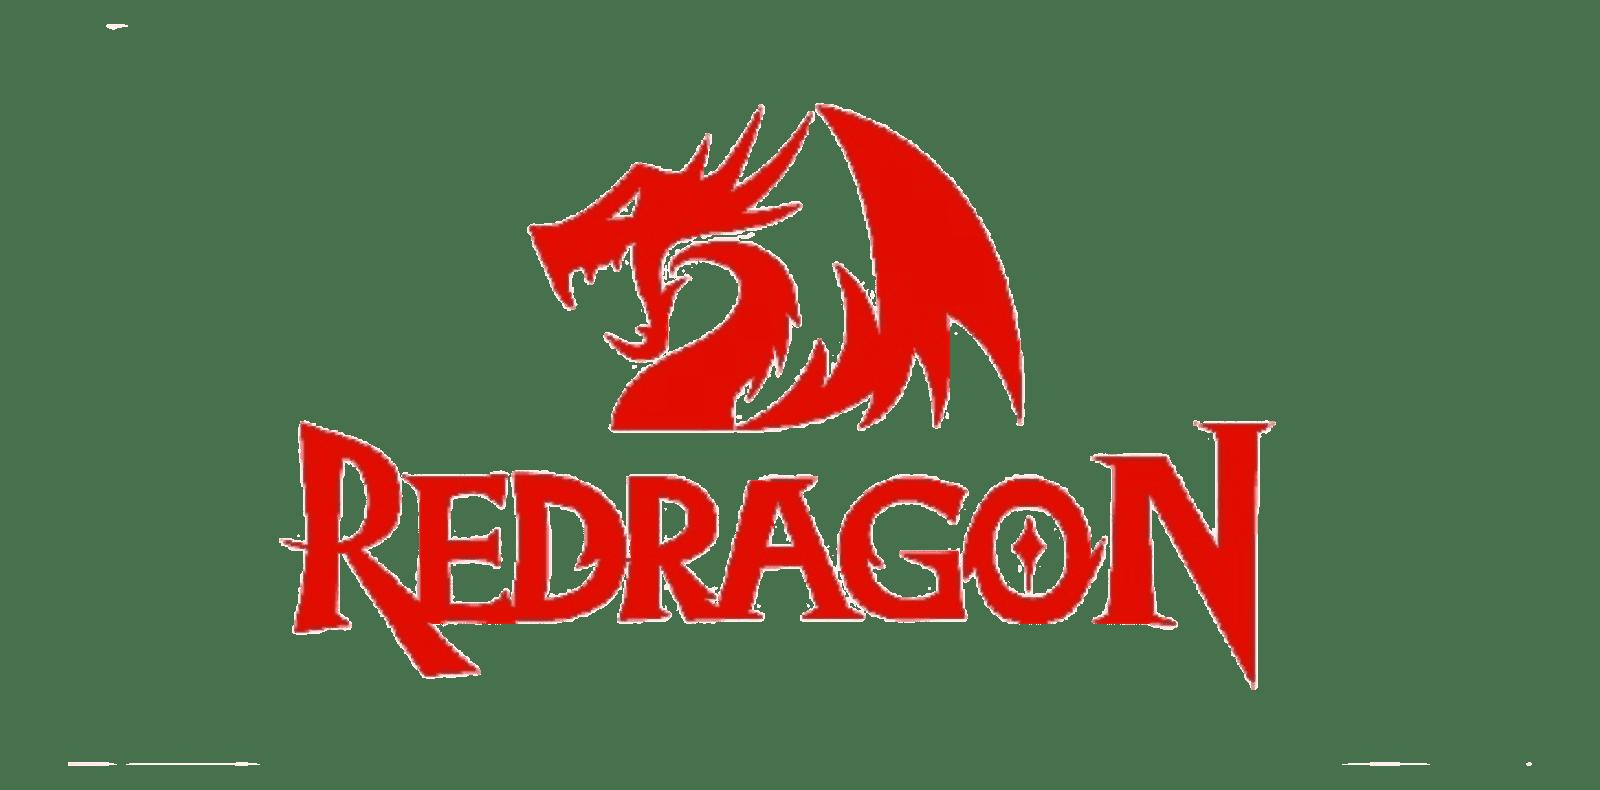 Redragonzone